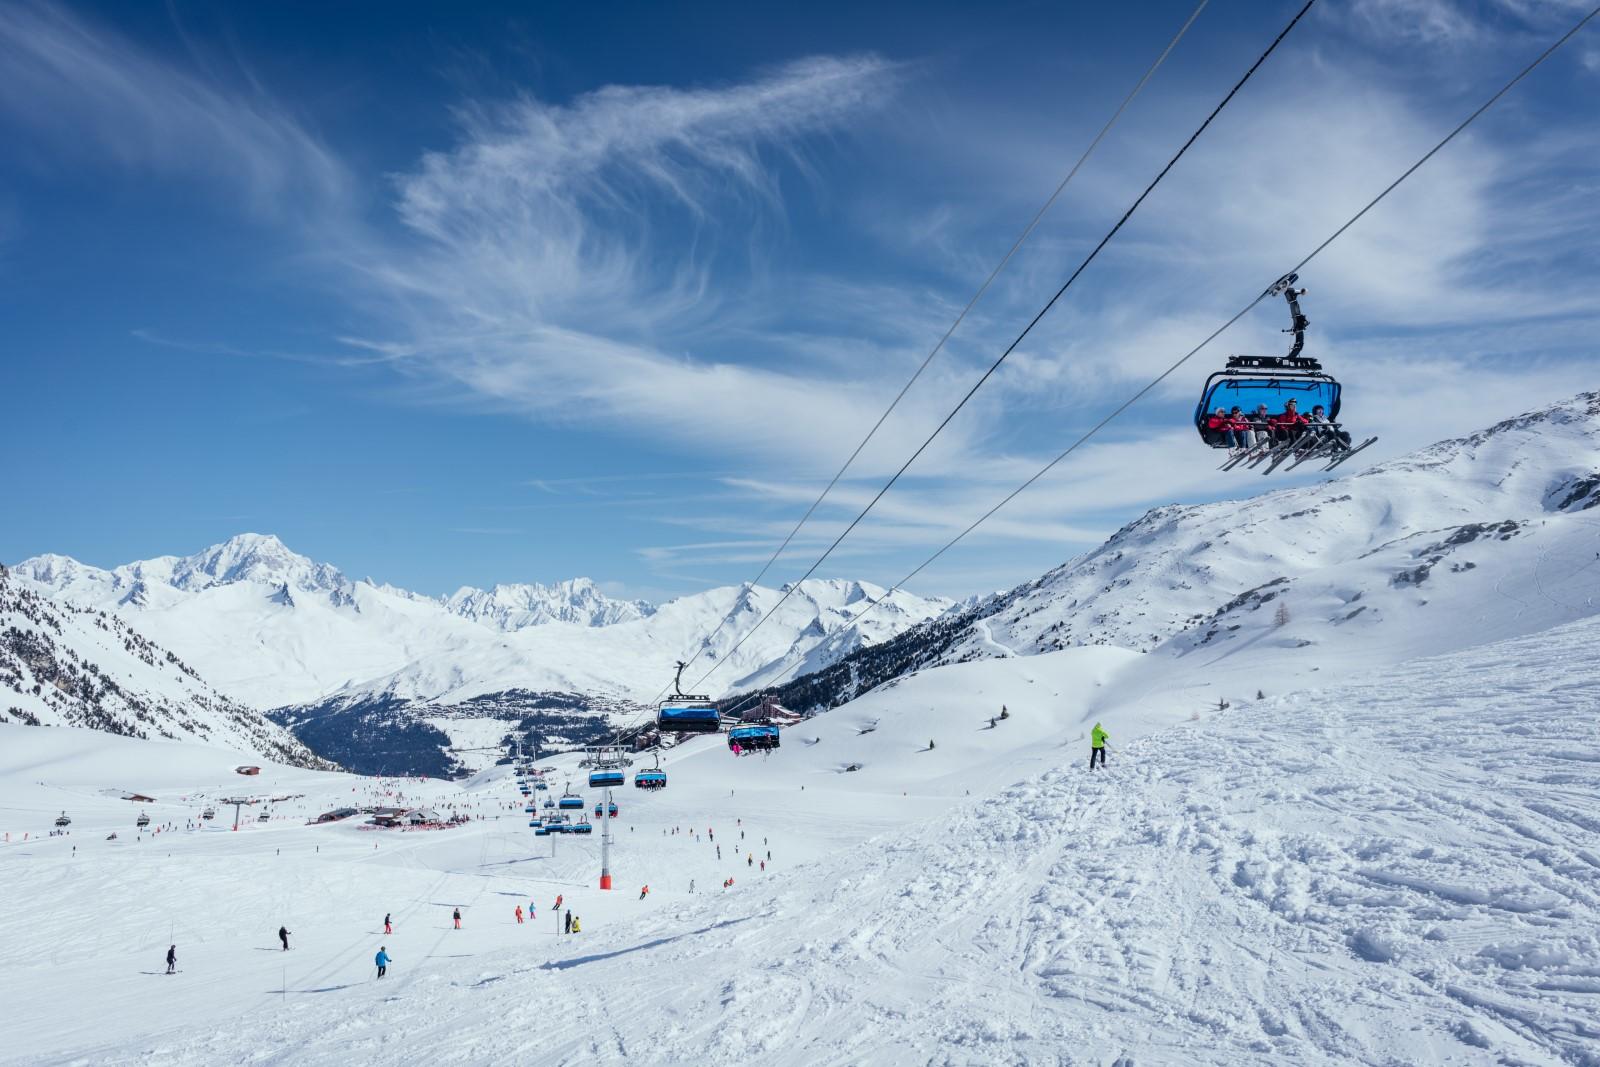 domaine skiable paradiski